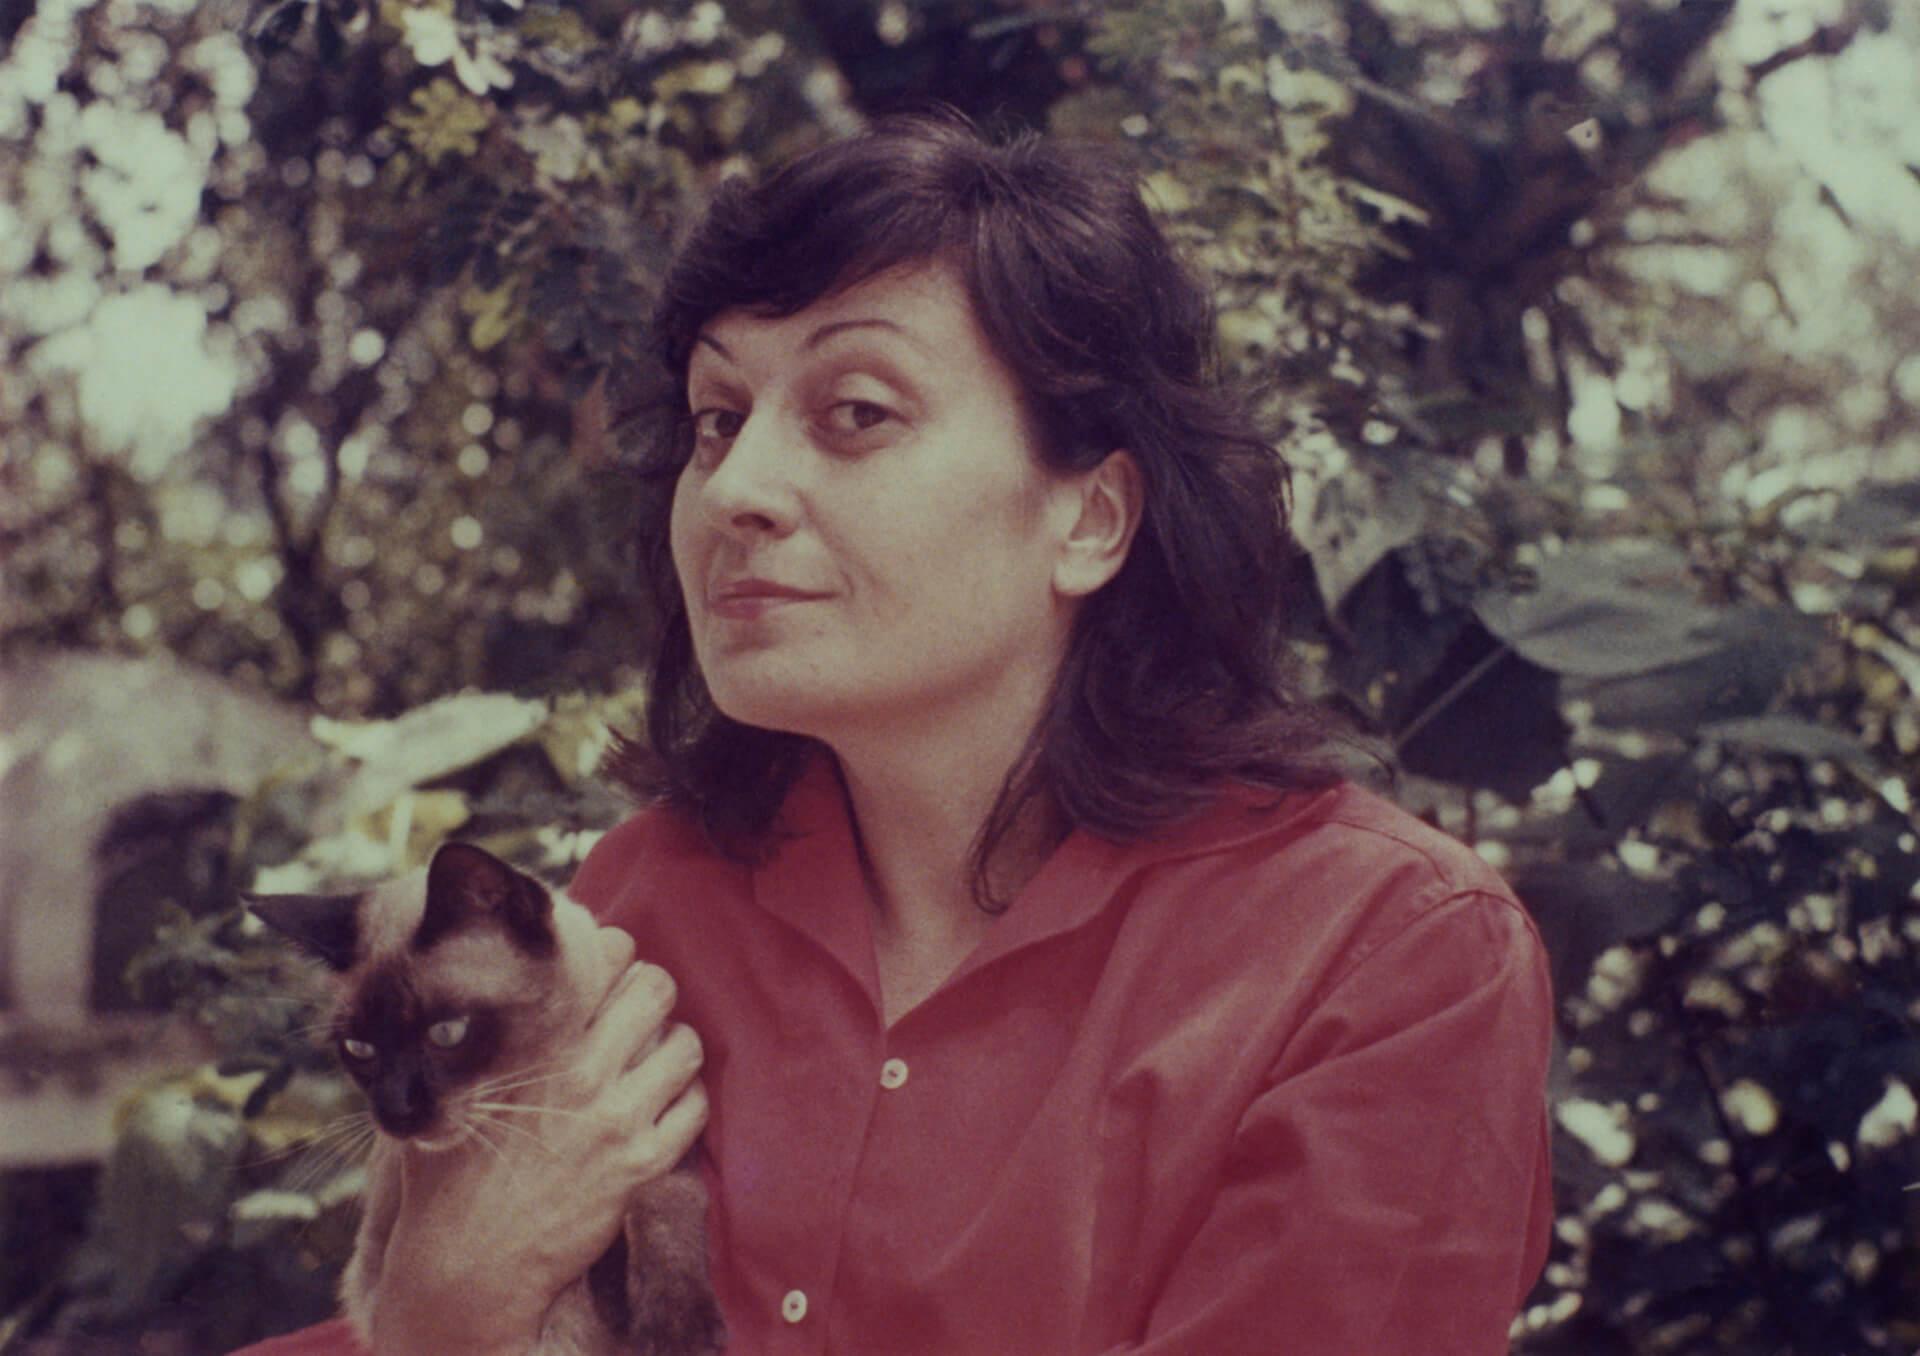 Lina Bo Bardi to Receive Posthumous Golden Lion for Lifetime Achievement